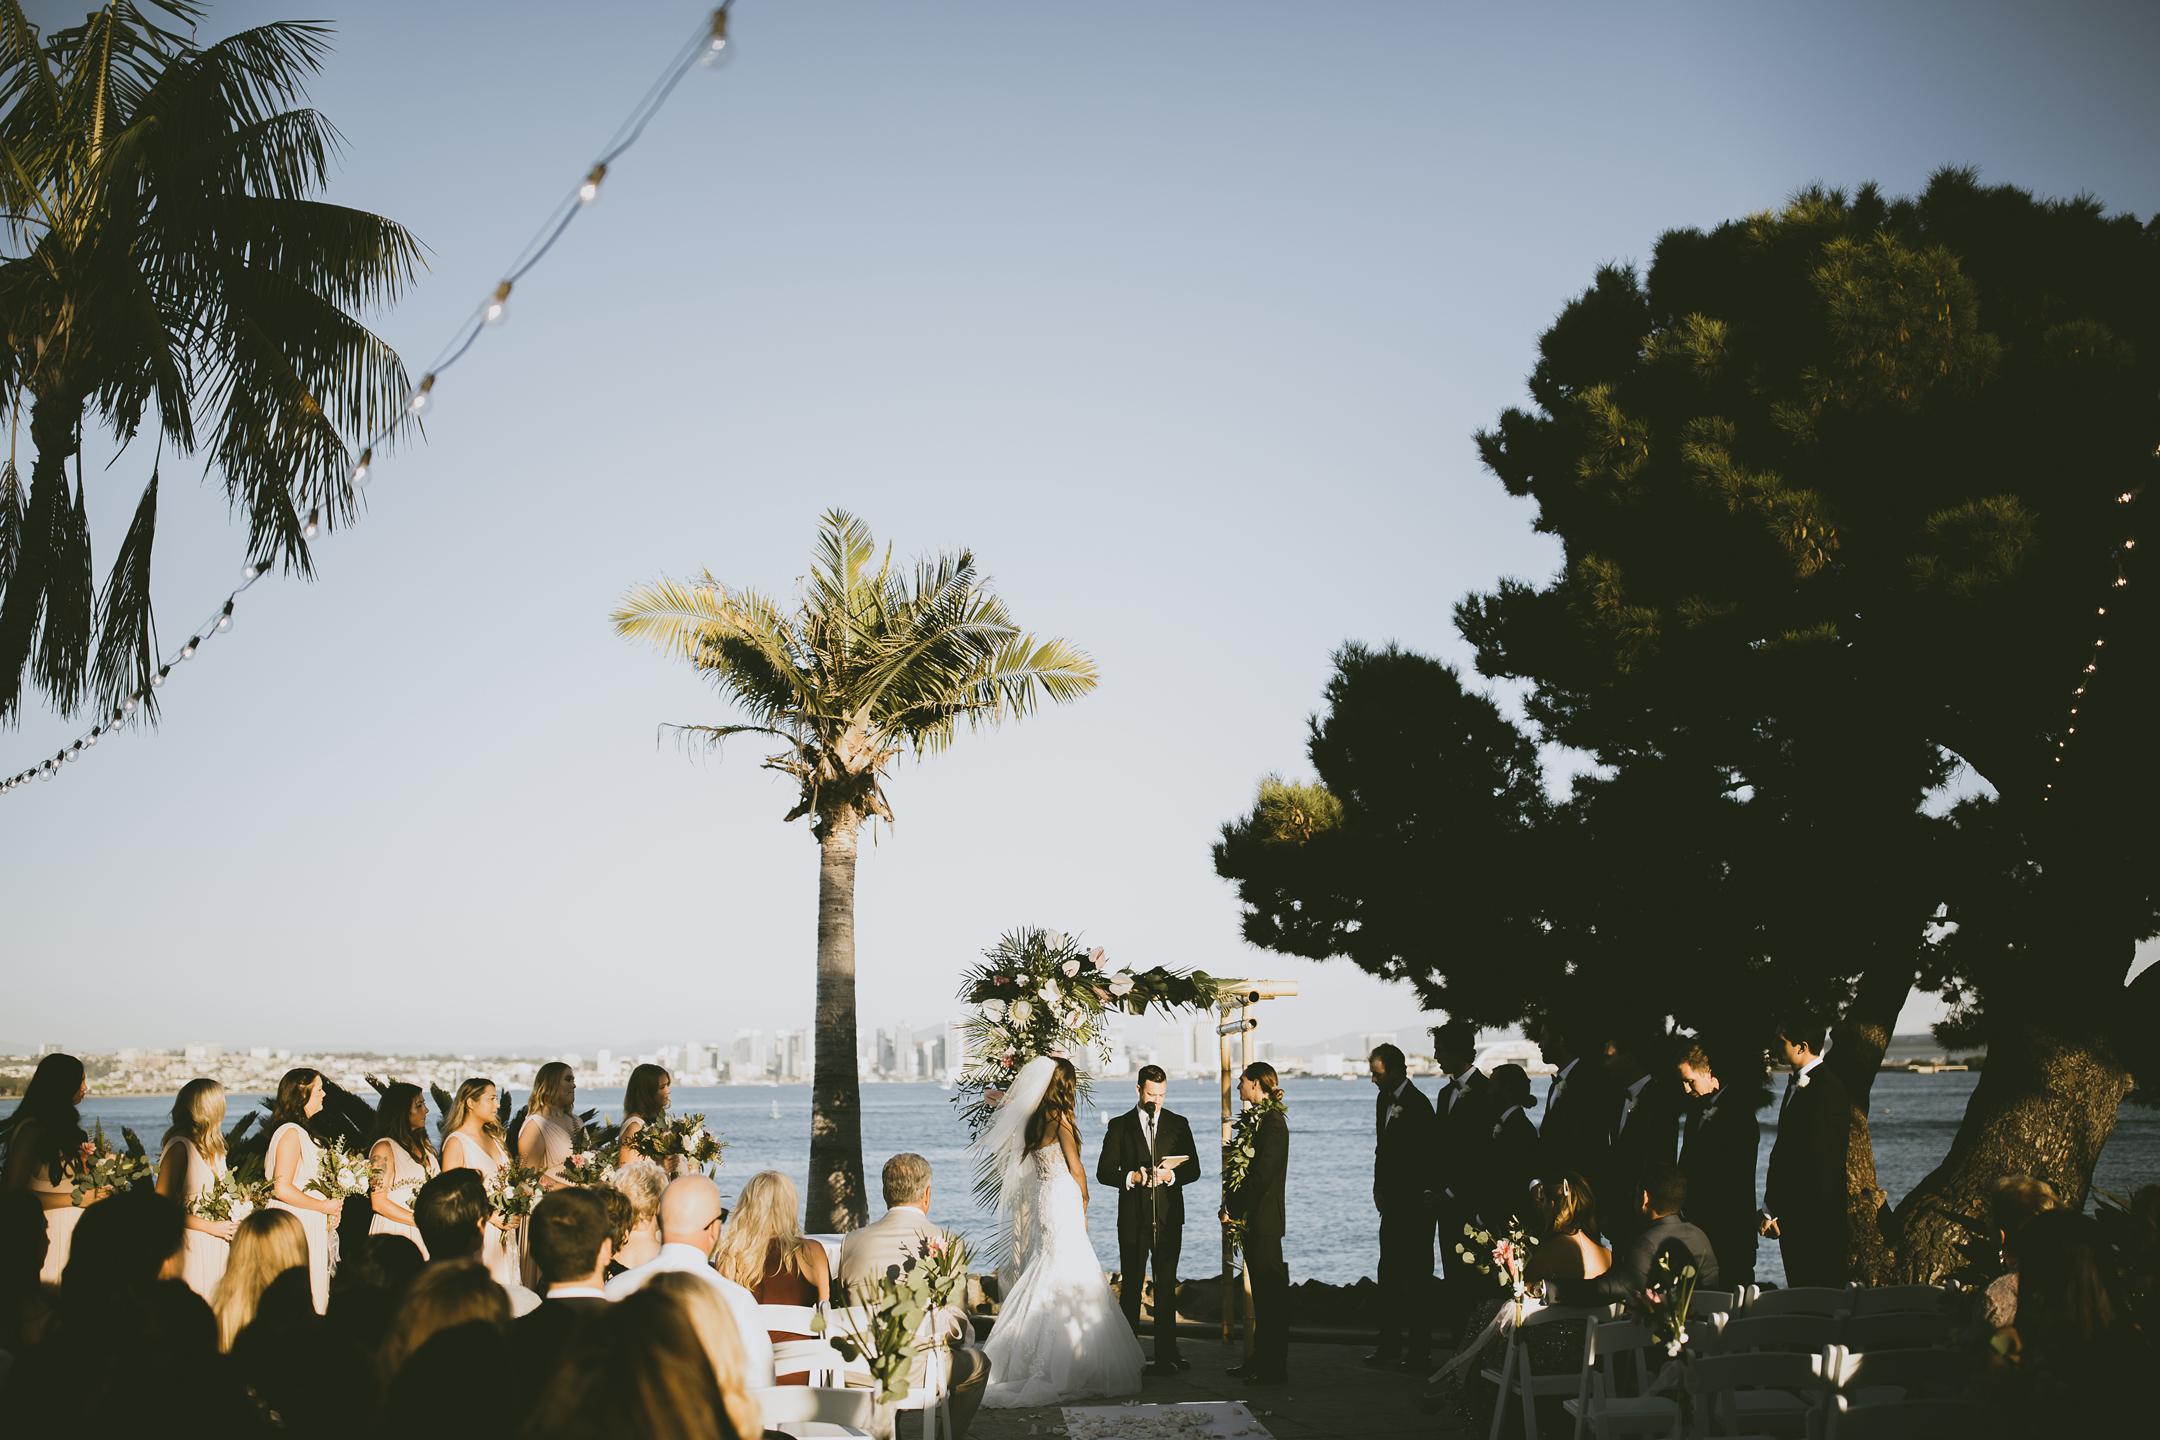 WEDDING PHOTOS: Bali Hai Restaurant, Shelter Island